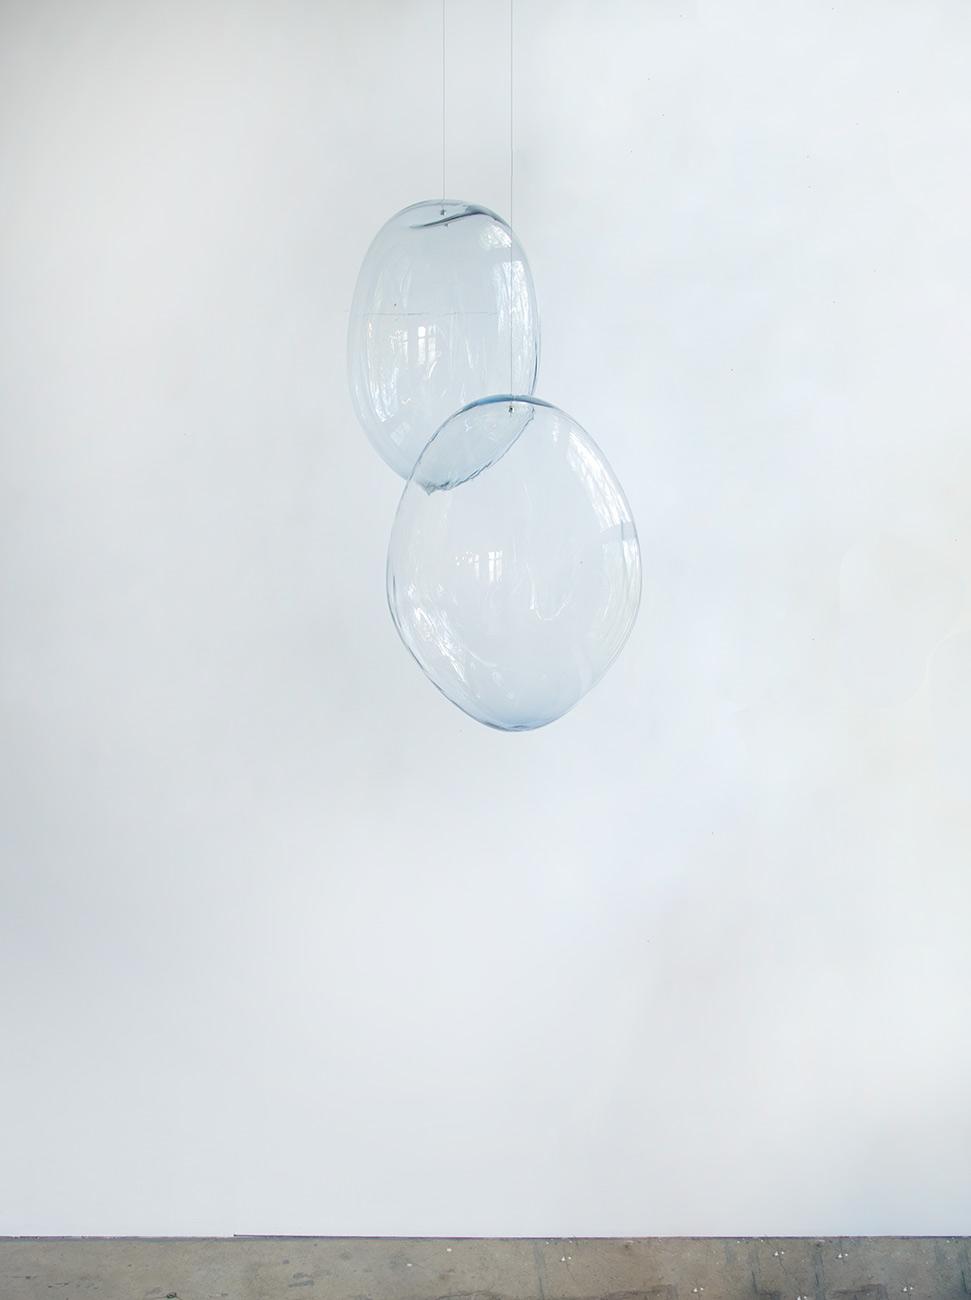 Blown_Glass_H_web.jpg